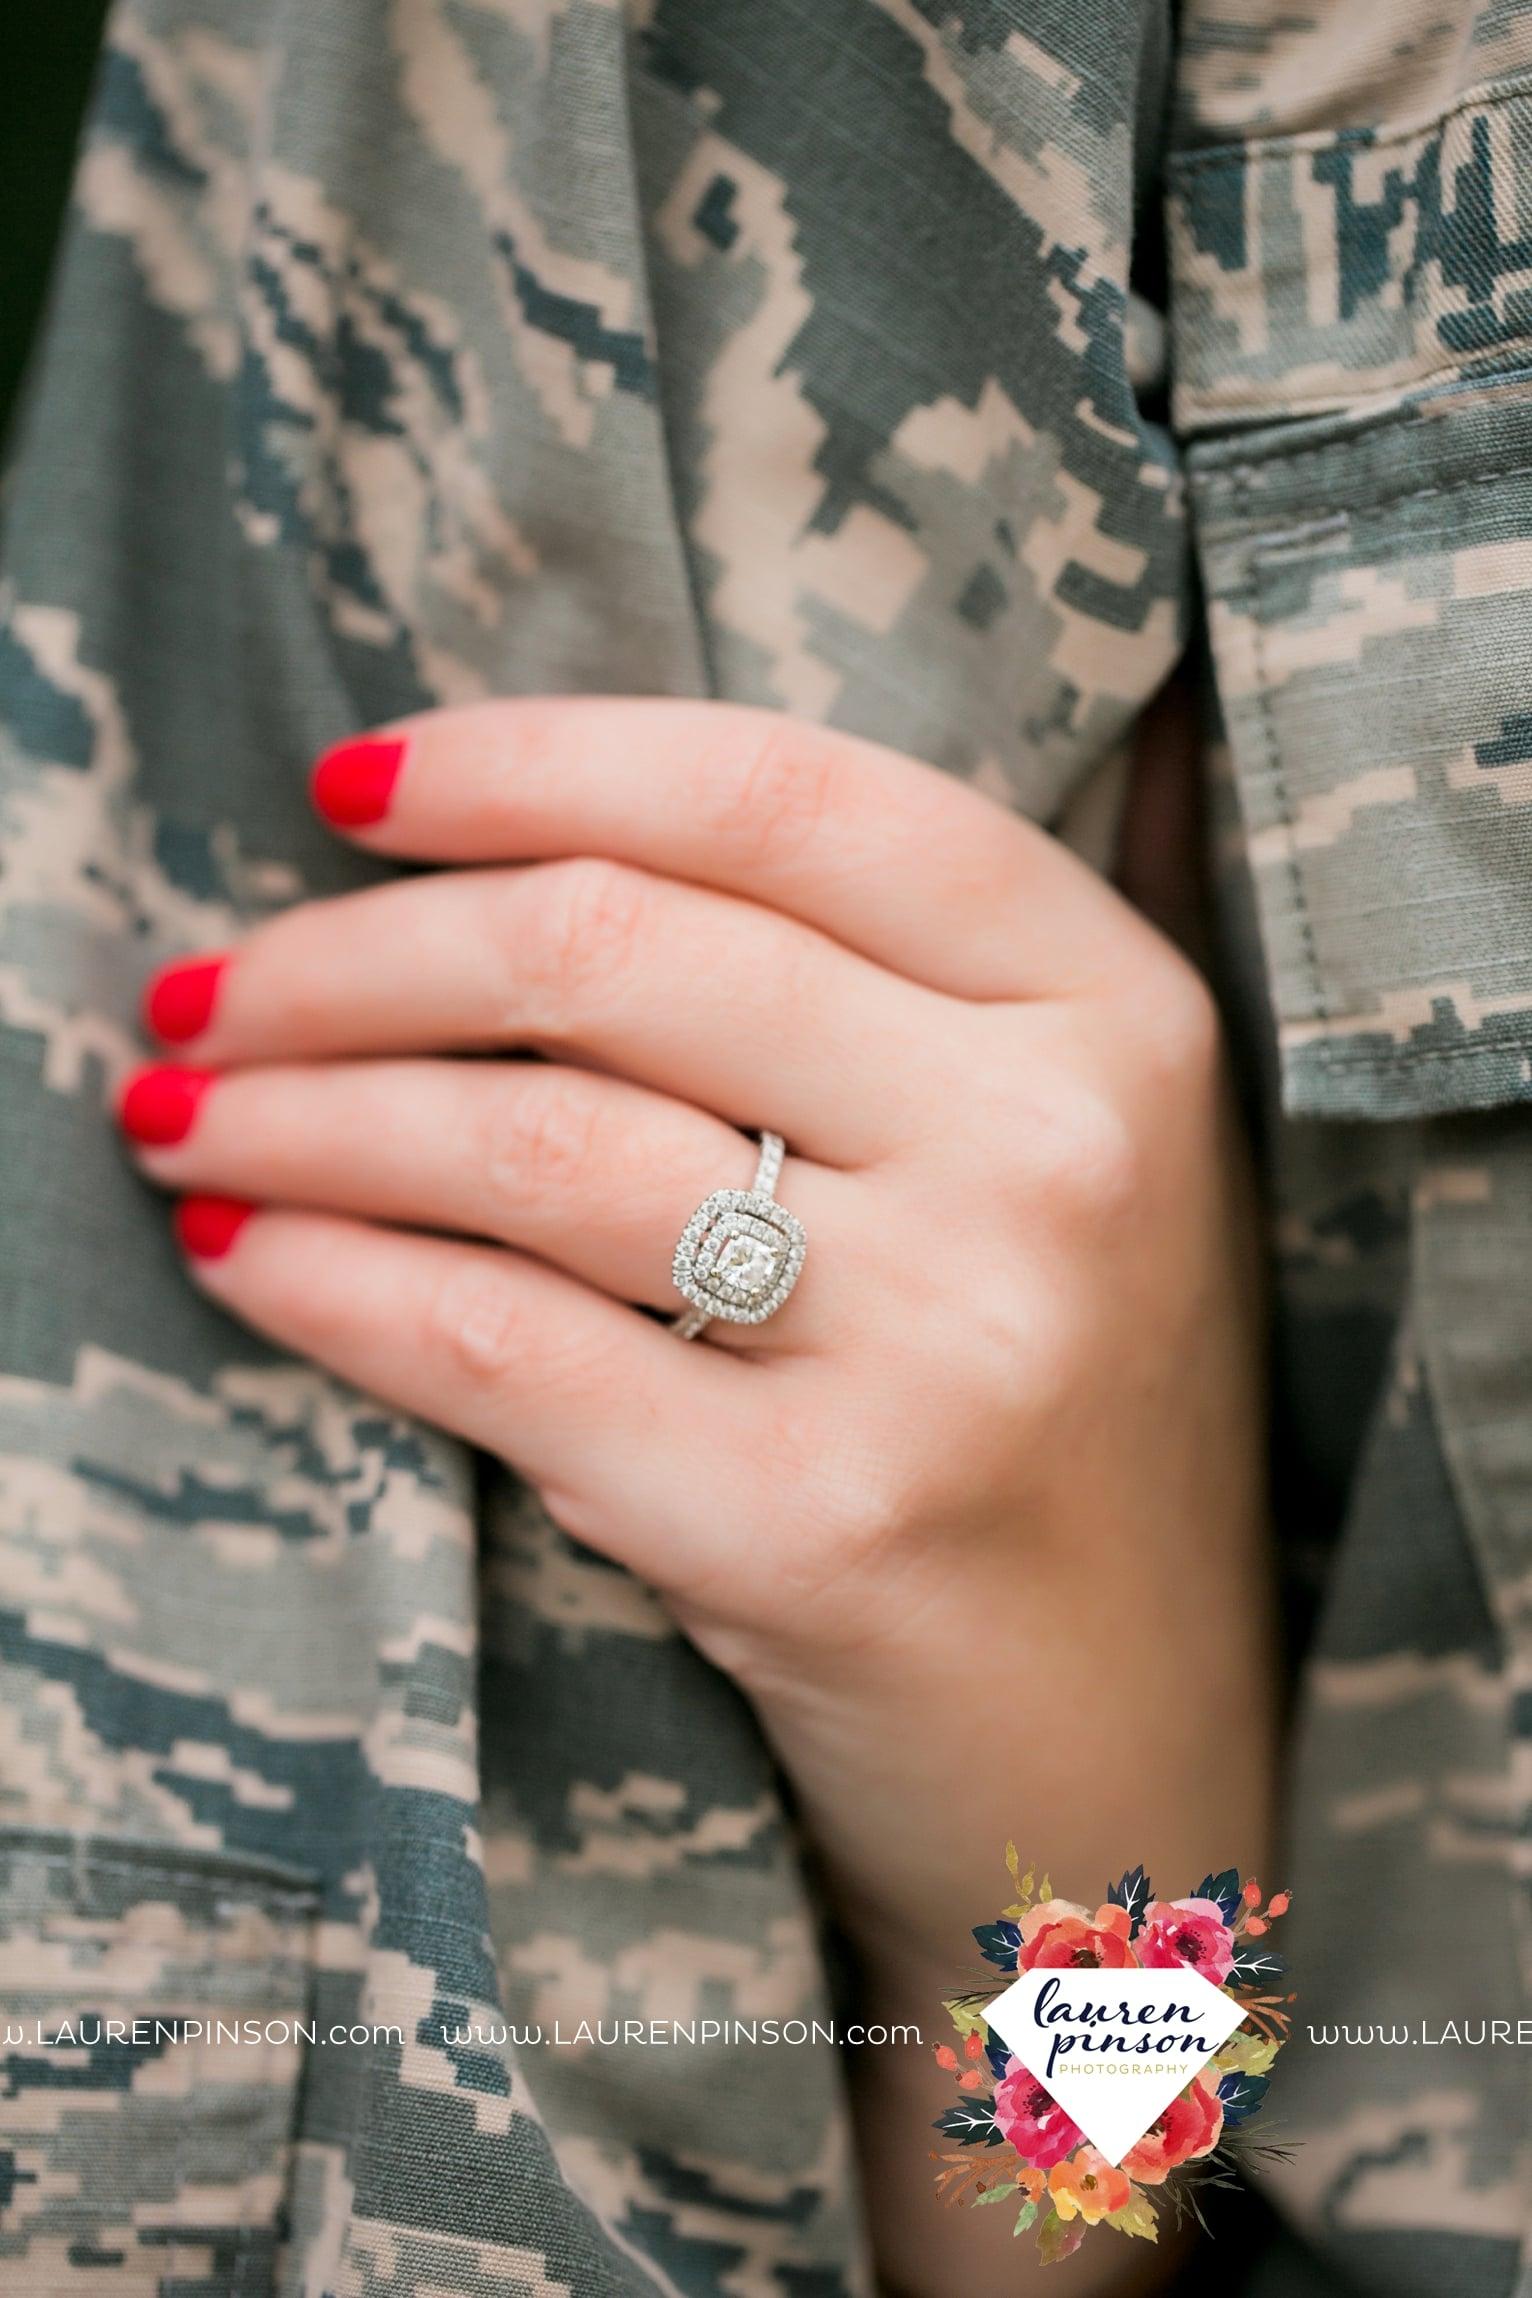 sheppard-afb-wichita-falls-engagement-session-airmen-in-uniform-abu-airplanes-bride-engagement-ring-texas-air-force-base_1993.jpg